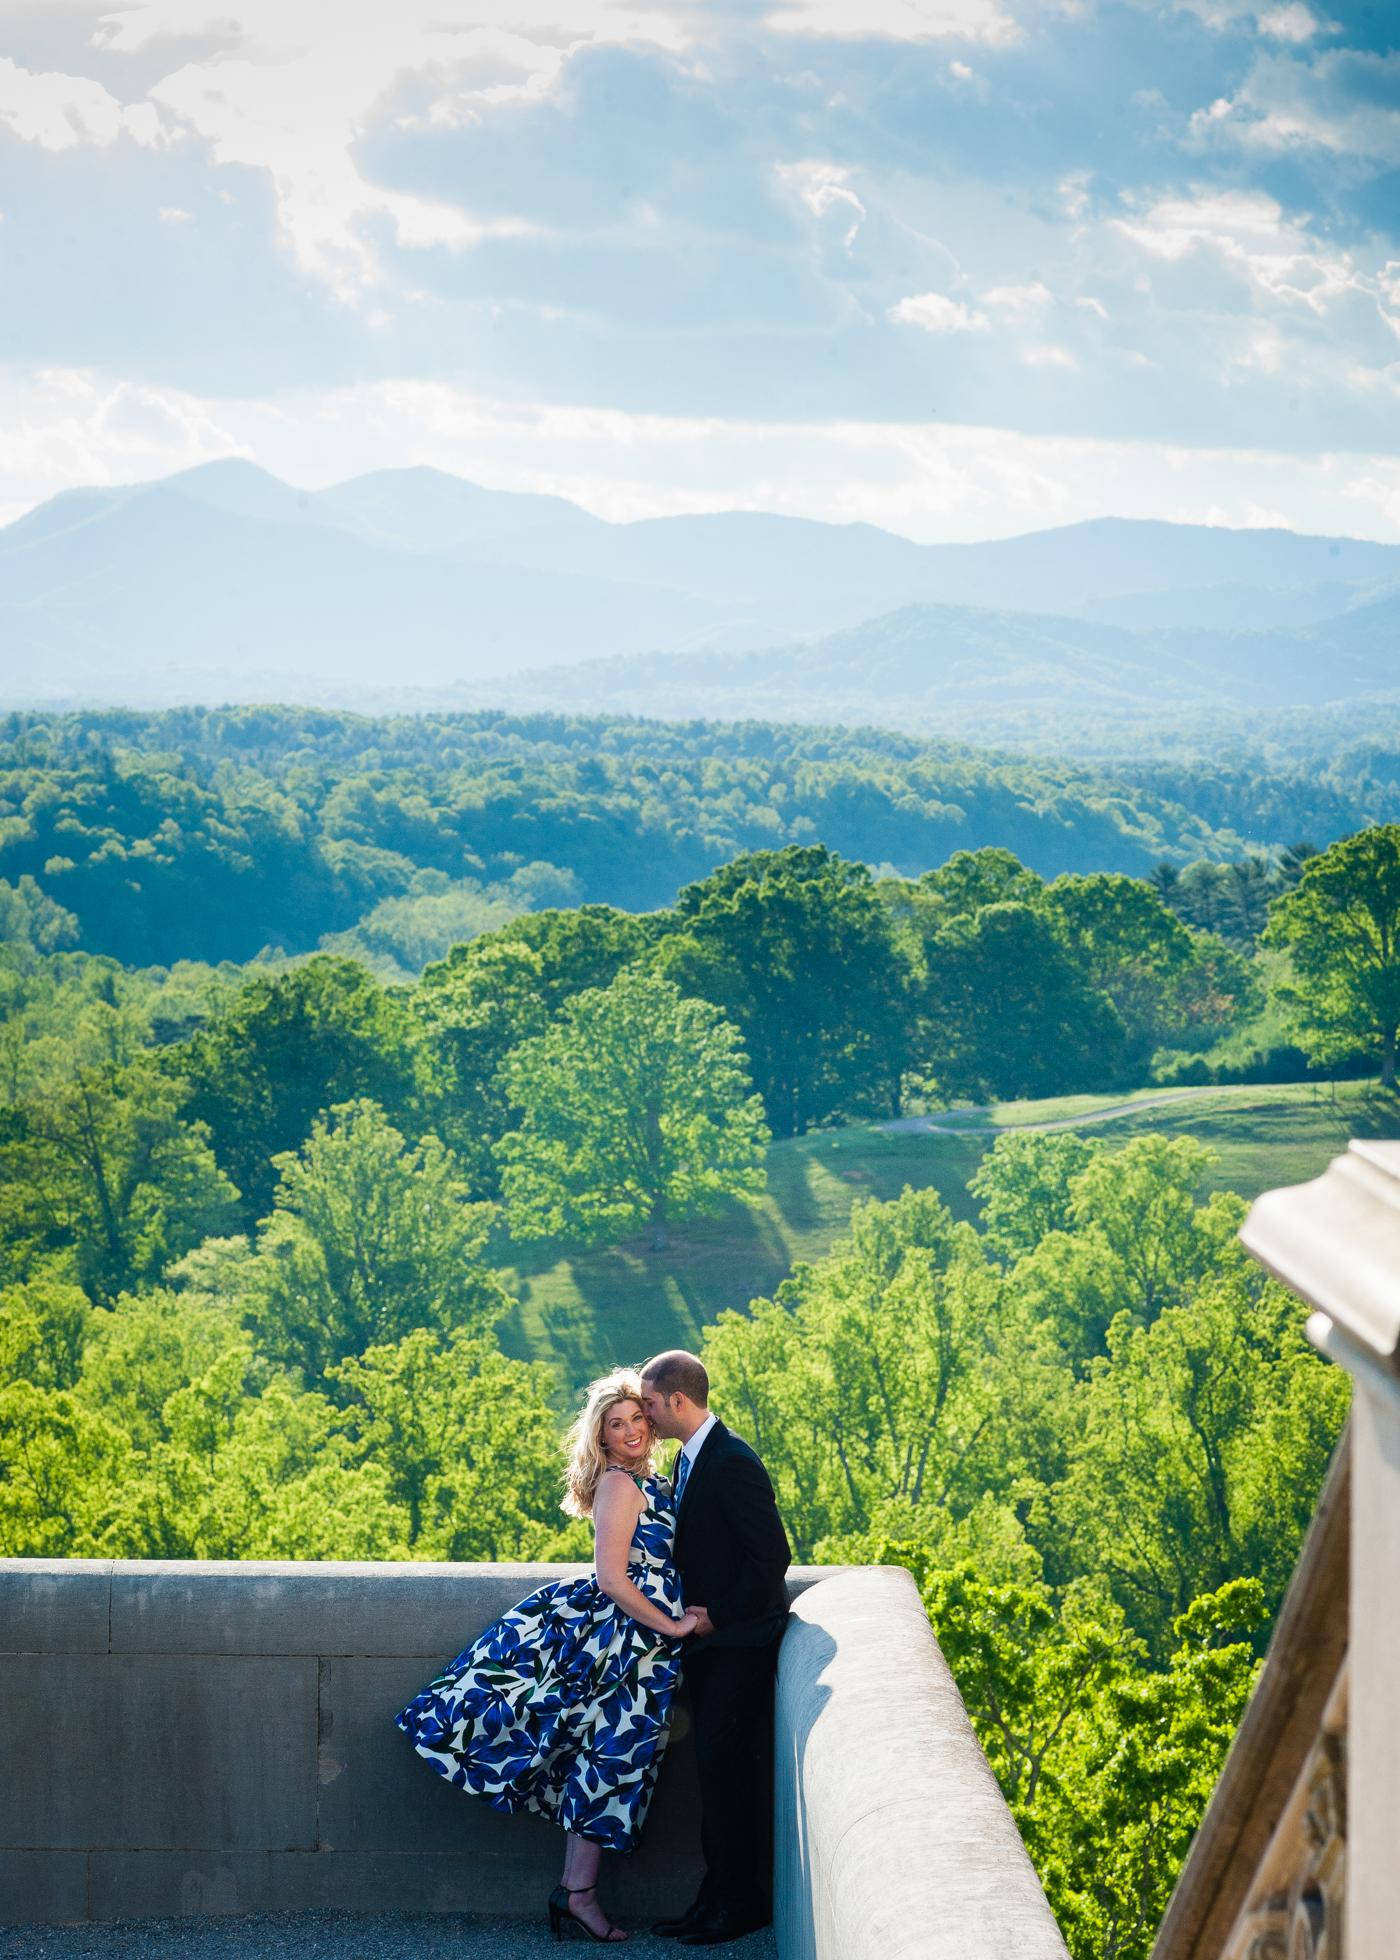 biltmore estate engagement photo on veranda with mountains behind